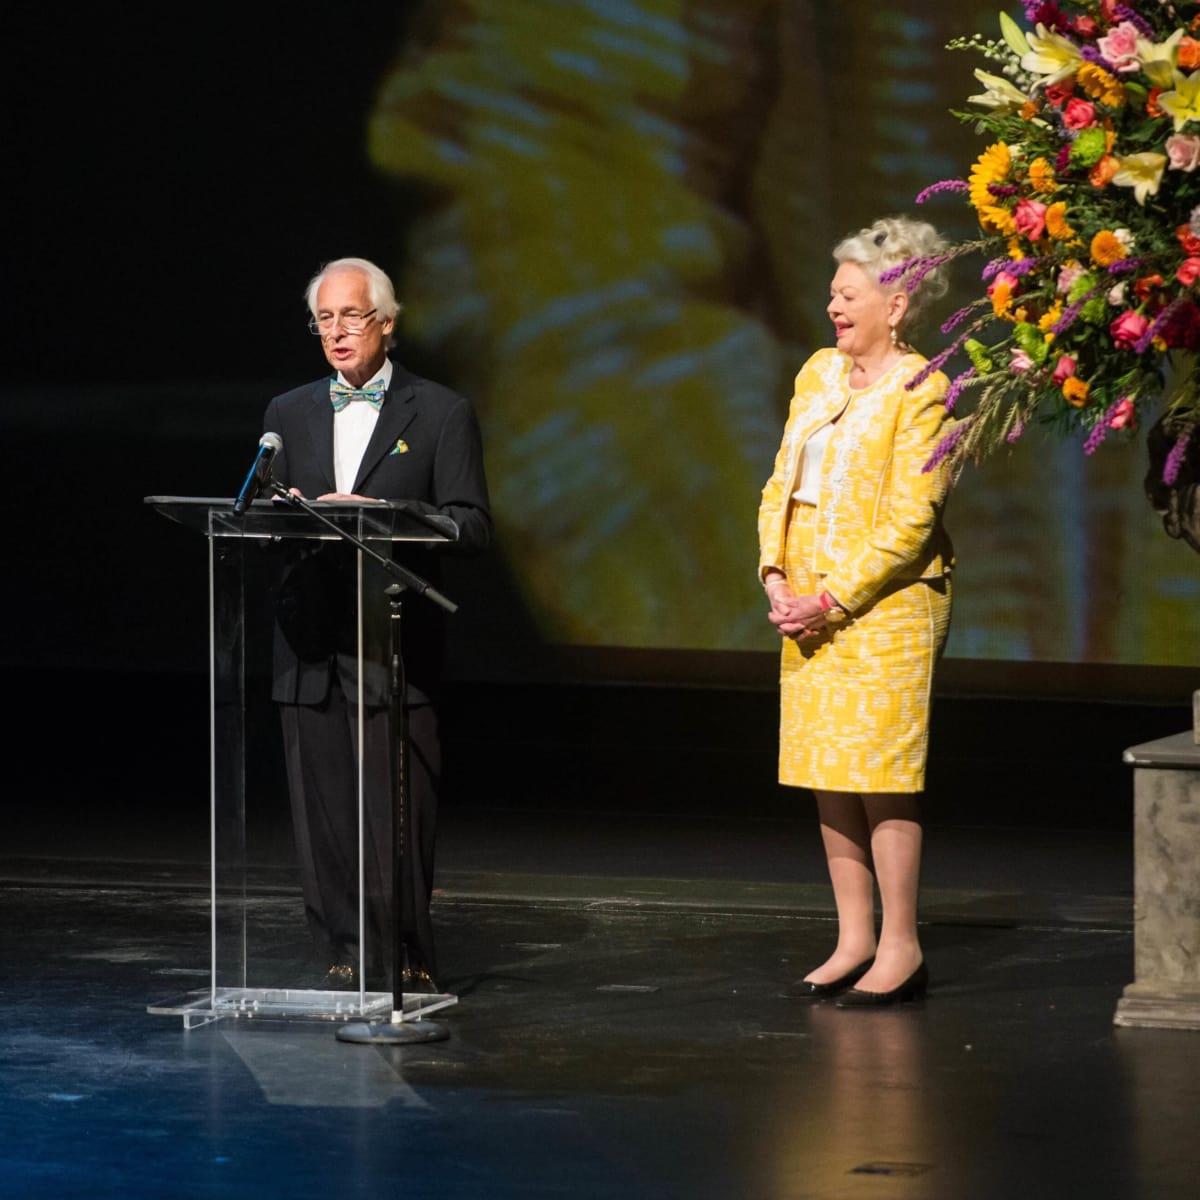 HGO Rudy Avelar Tribute, 9/16, Jerry Cooney, Bobbie-Vee Cooney